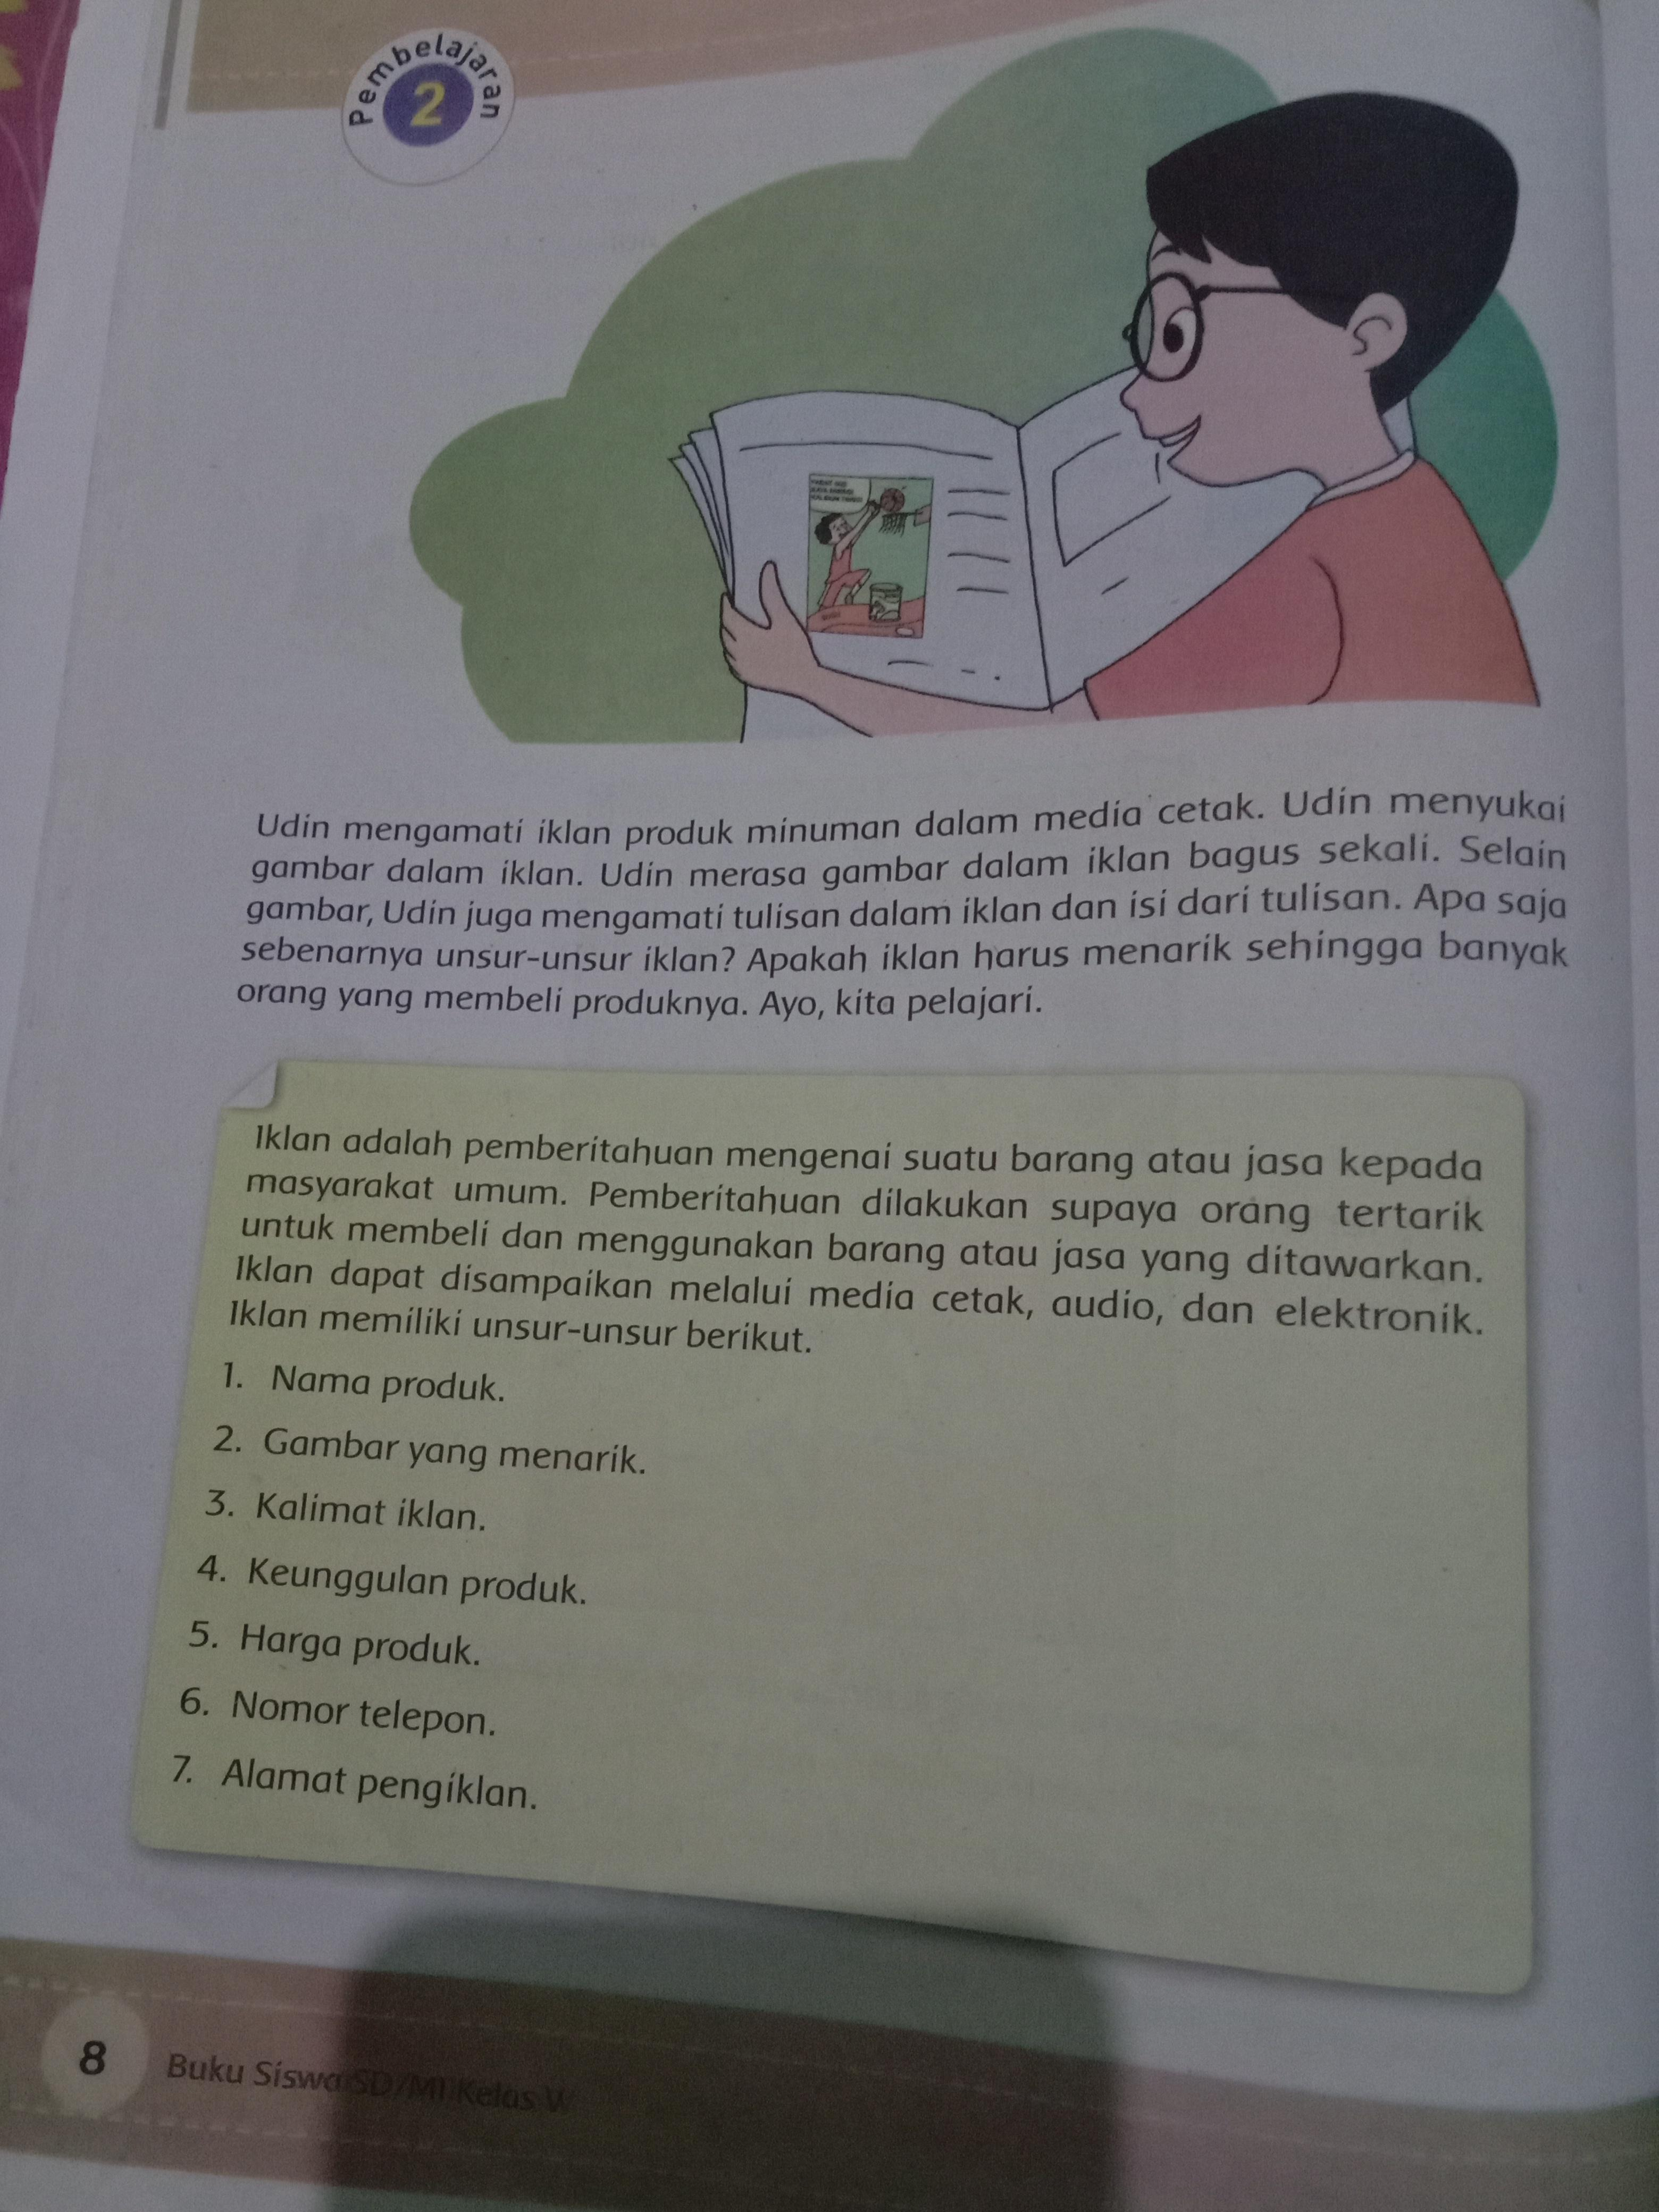 Amatilah gambar pada halaman 20. Apakah iklan tersebut memenuhi ...